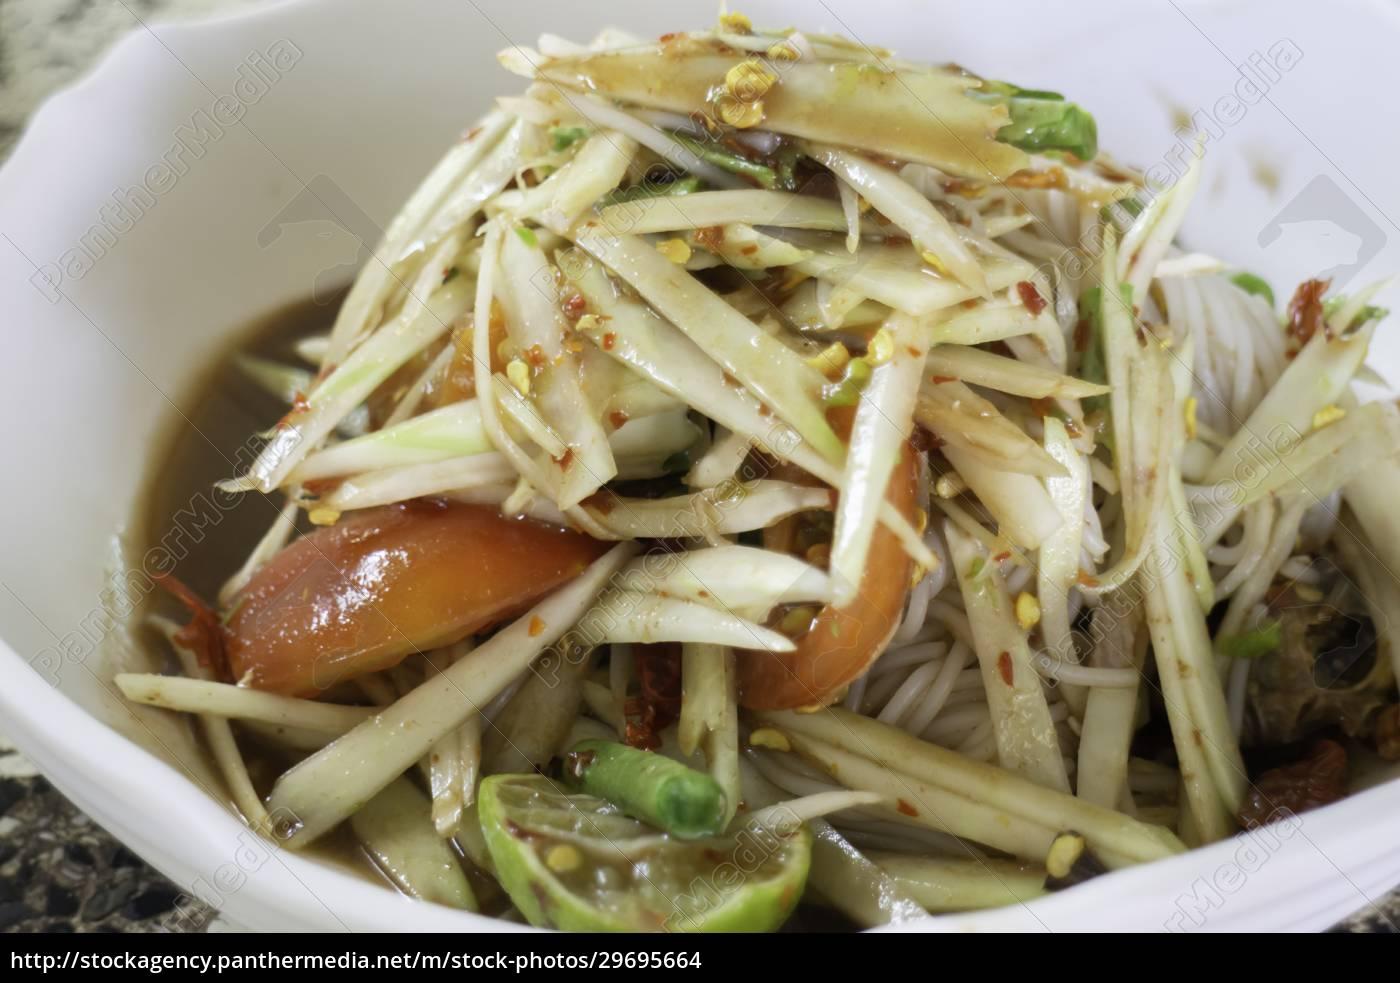 spicy, green, papaya, salad, serve - 29695664